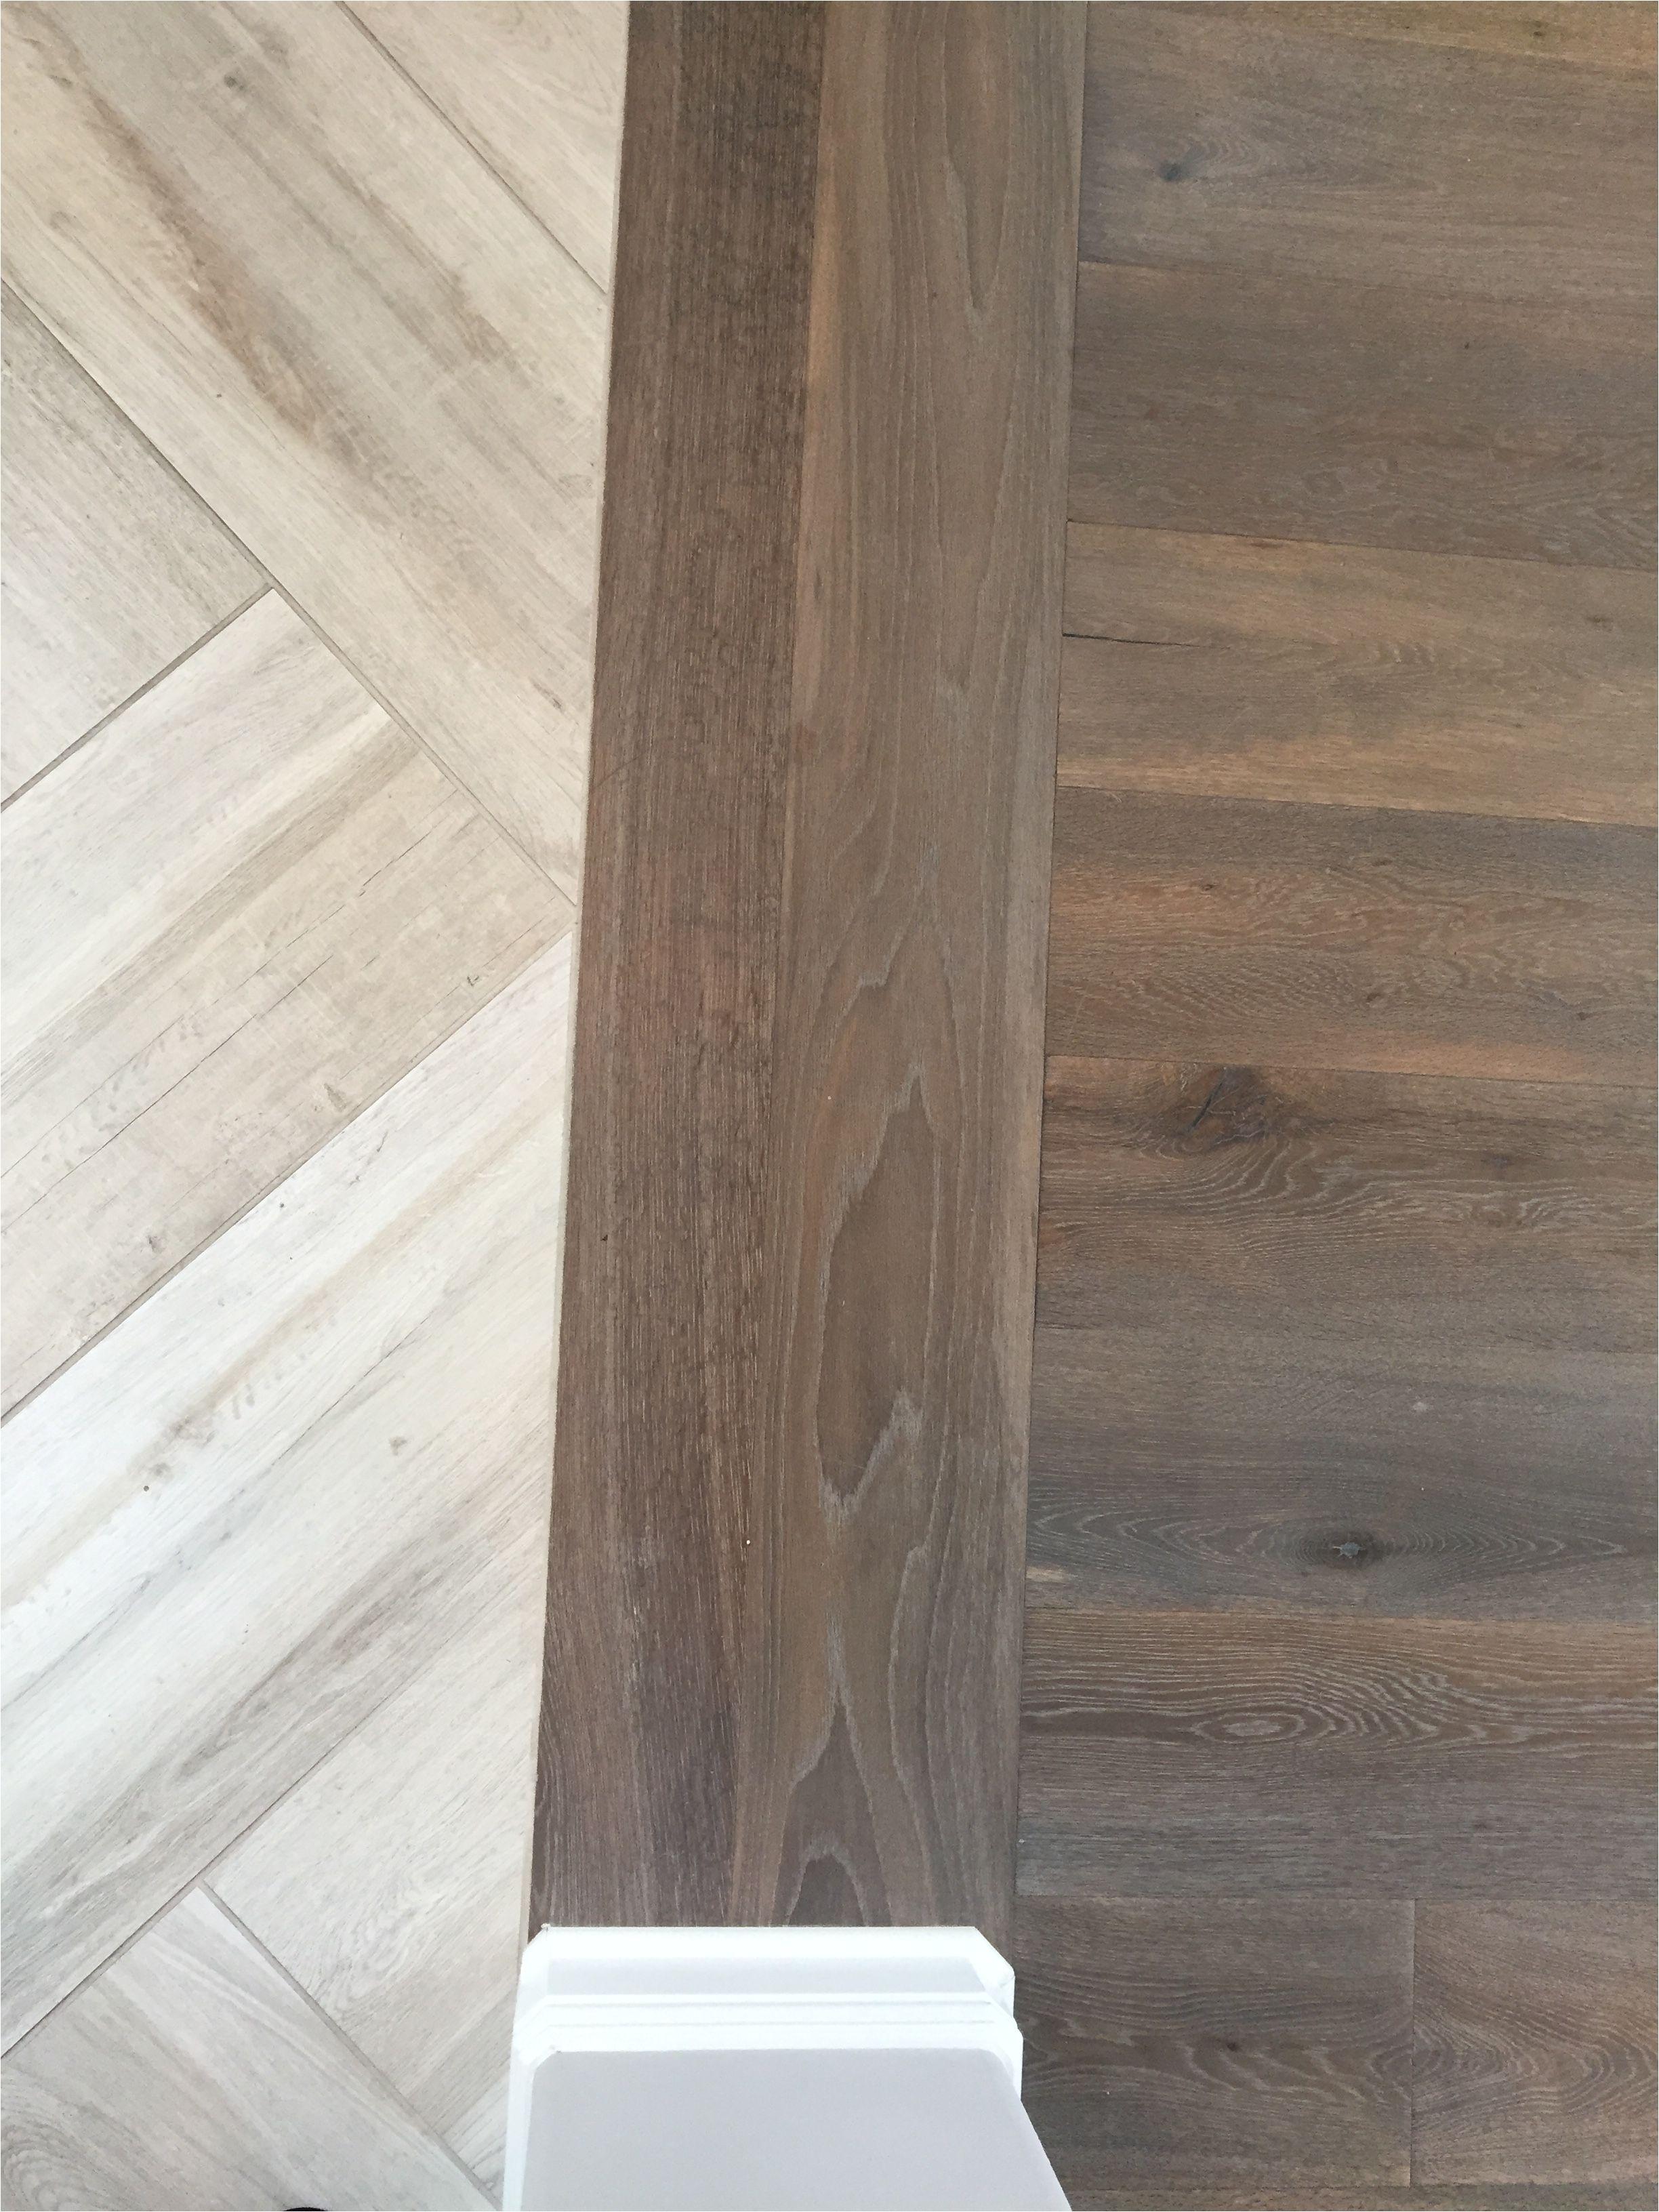 Best Flooring for Concrete Slab In Florida Floor Transition Laminate to Herringbone Tile Pattern Model